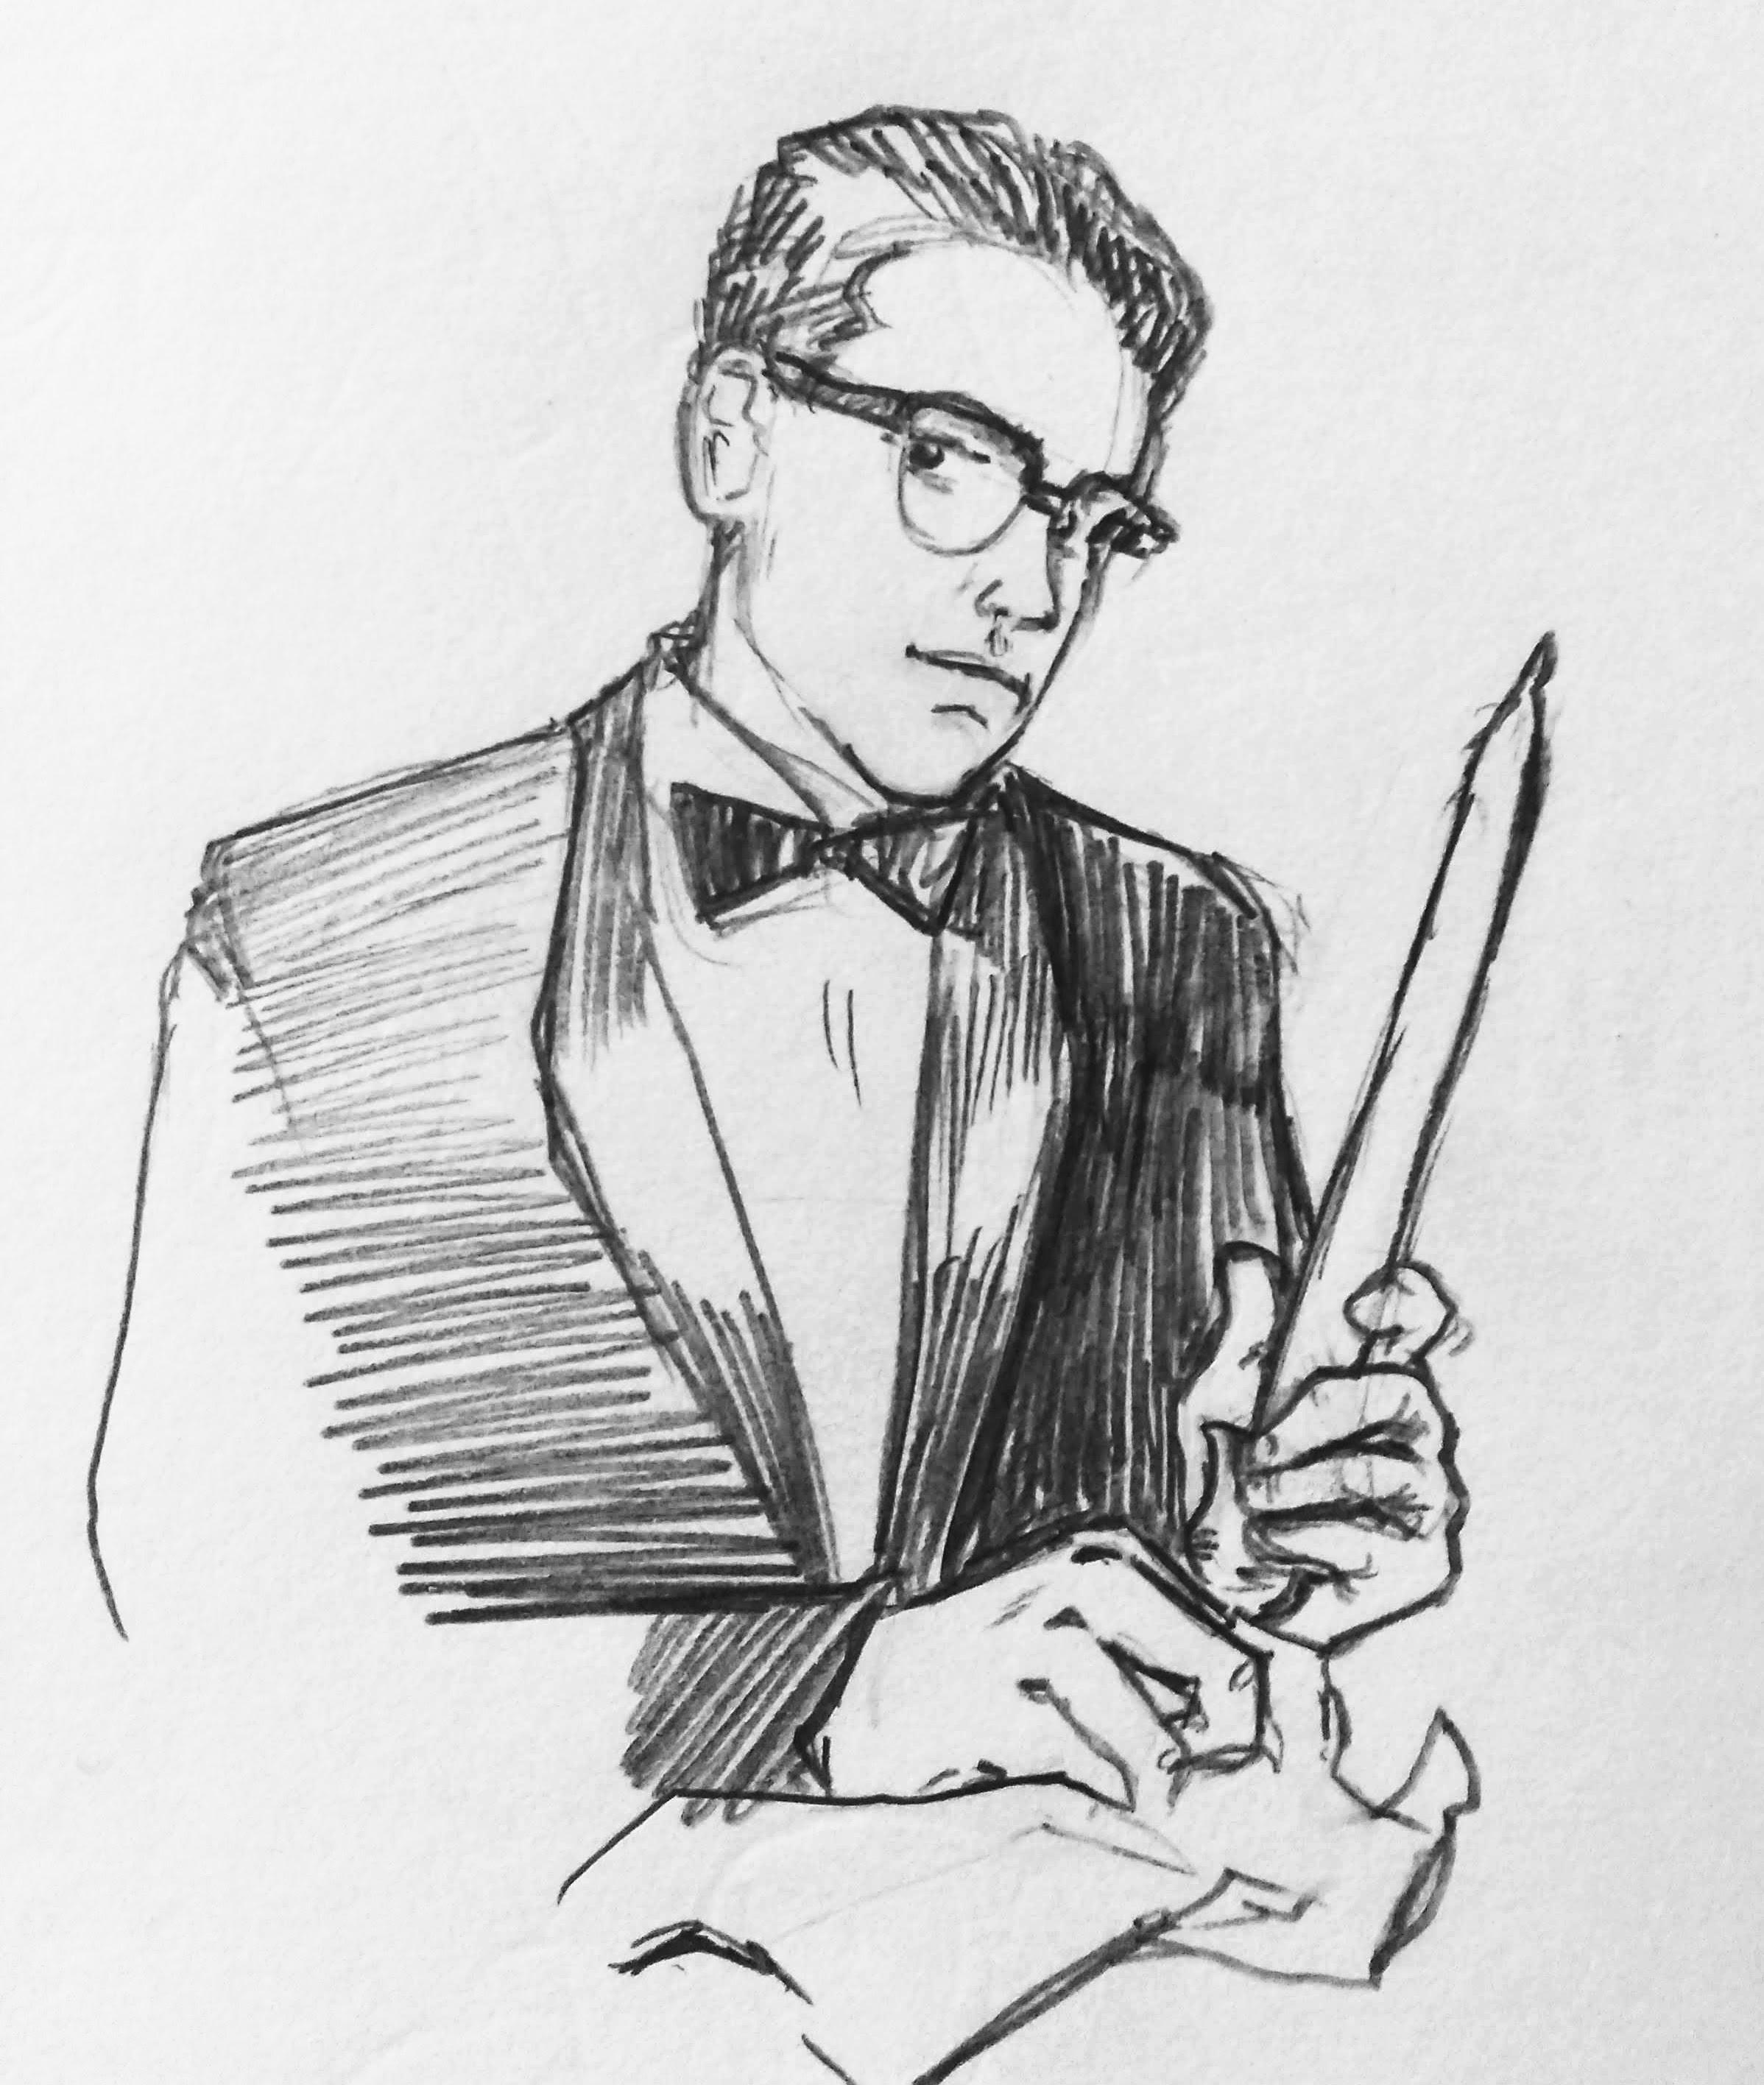 1986 John Flansburgh (ft candle)